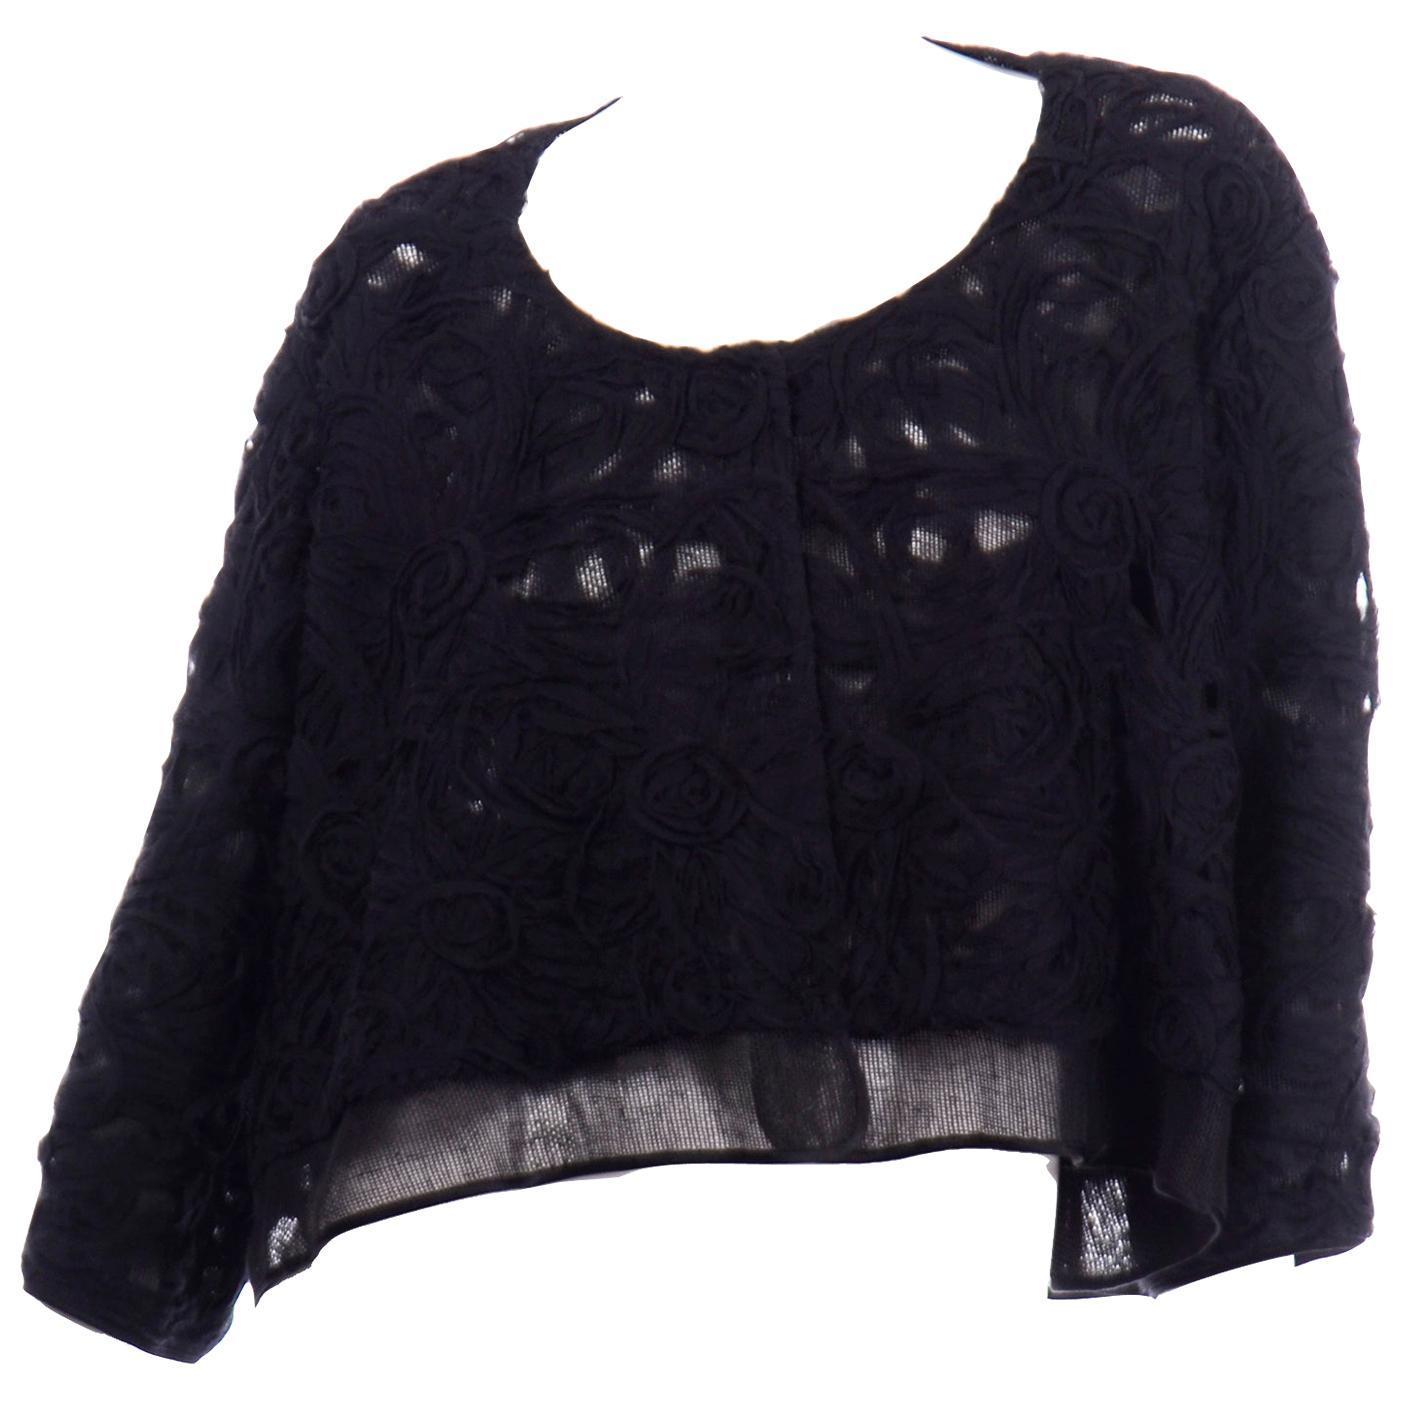 Alberta Ferretti Black Linen and Silk Jacket Top W Soutache Style Detail & Mesh